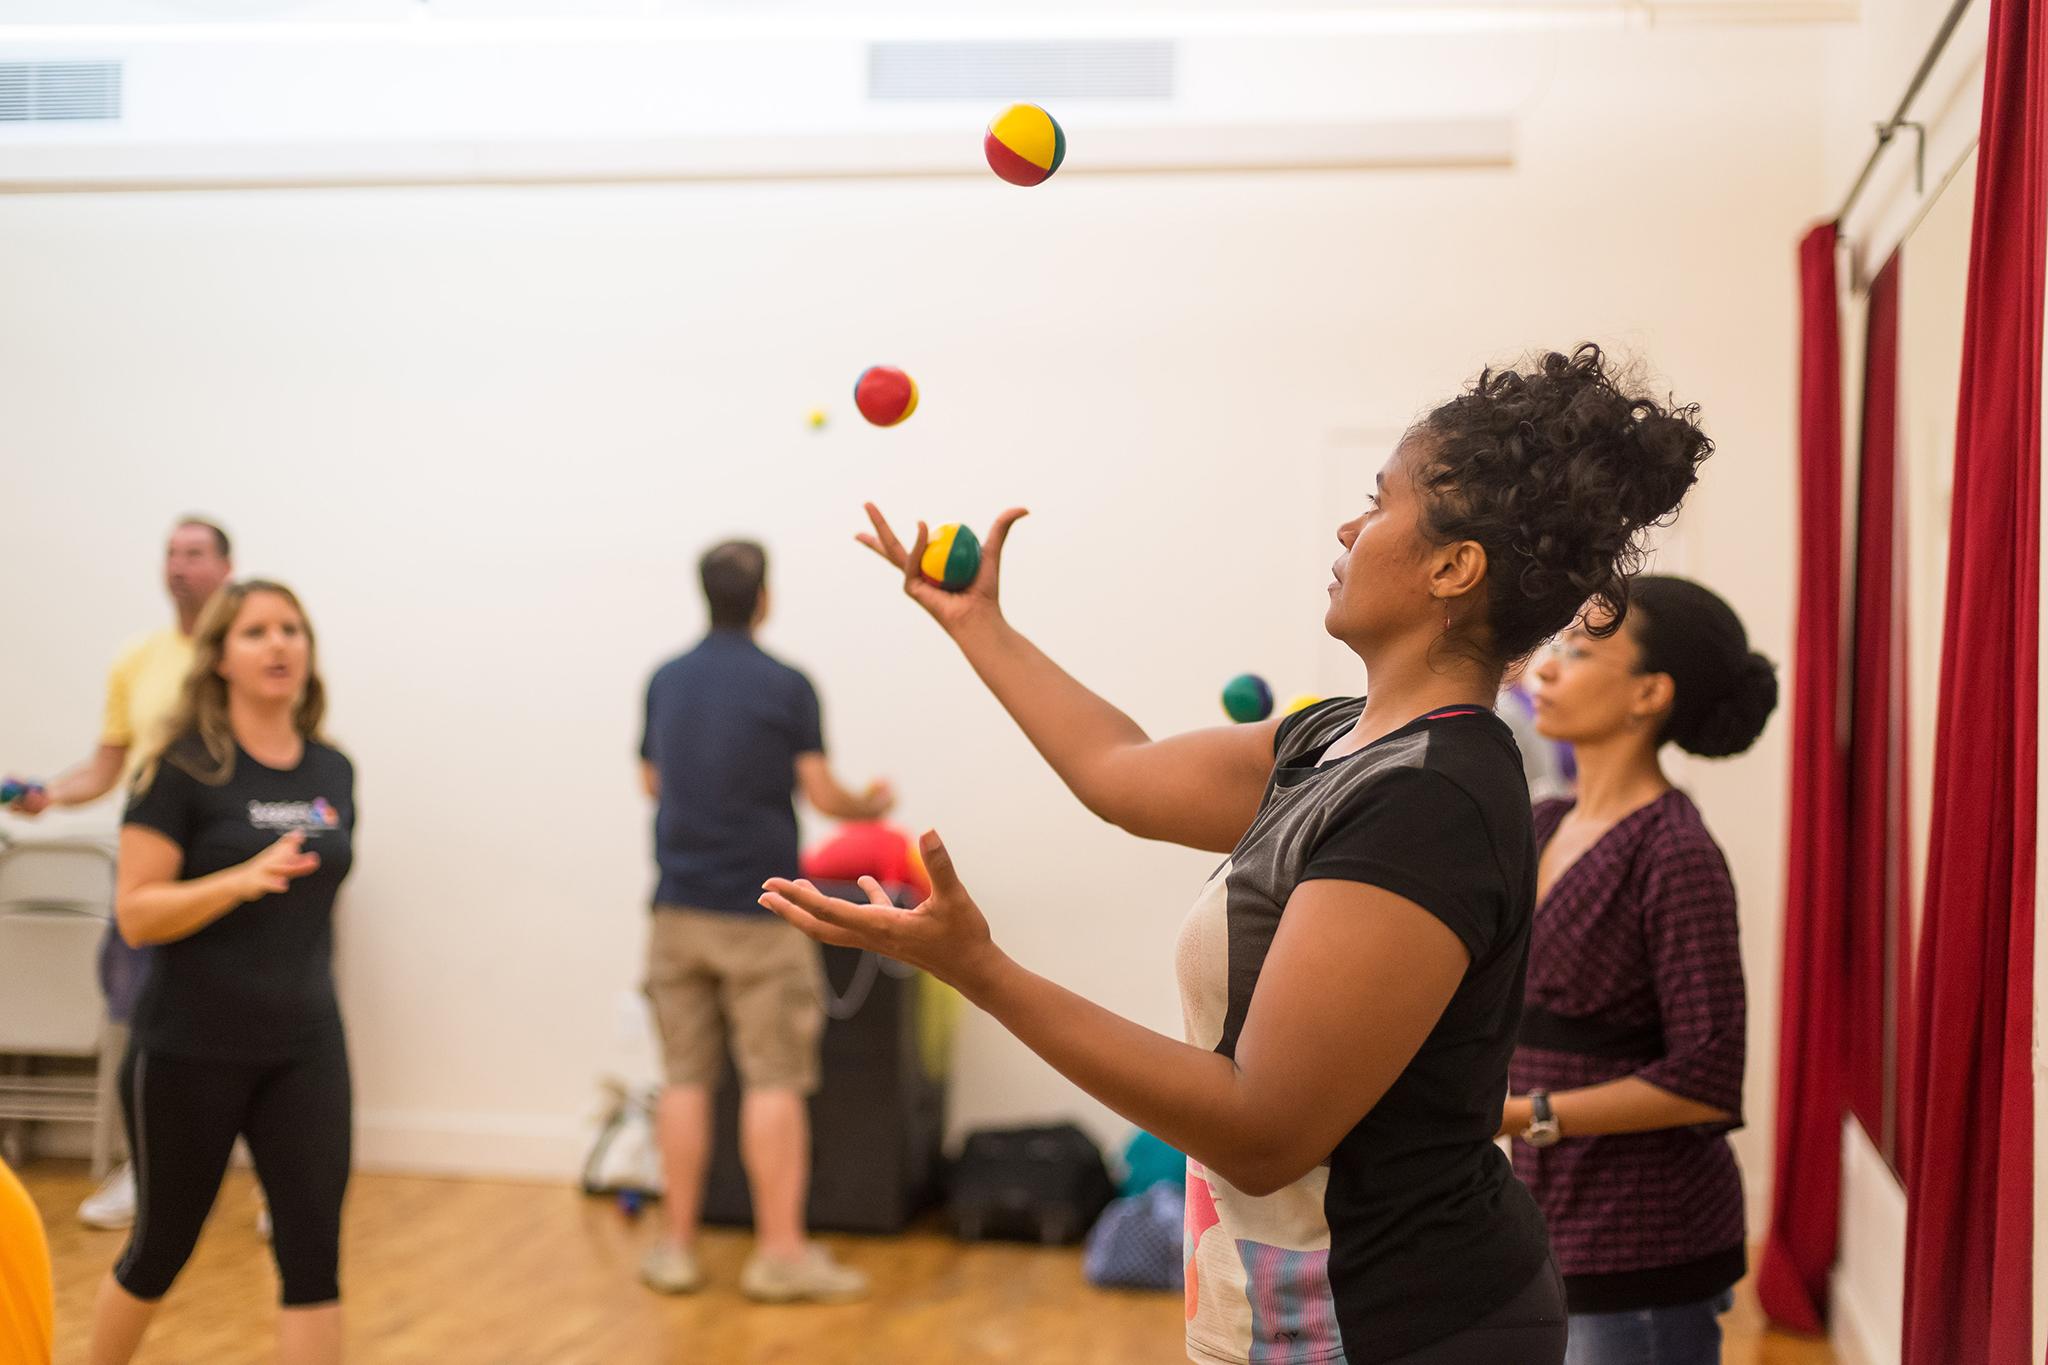 Learn to Juggle at JuggleFit